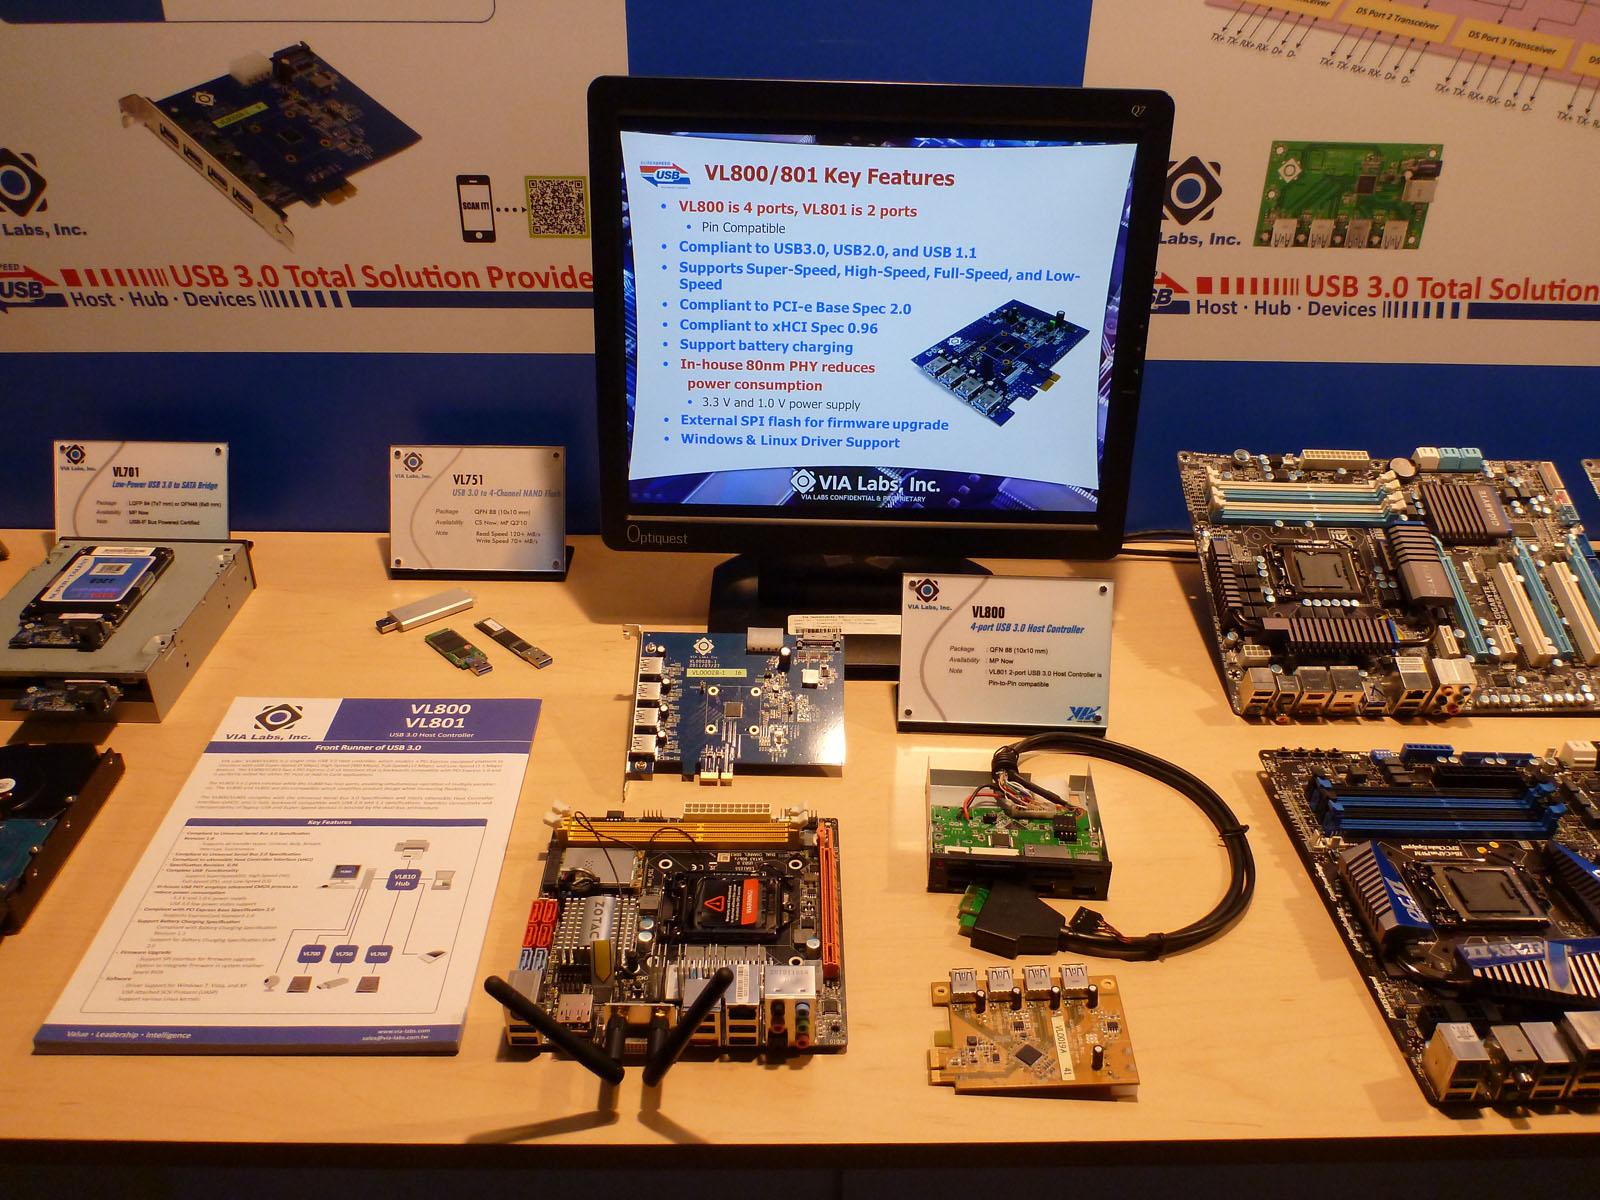 VIA VL800/801 USB 3.0 Host Controller 64x